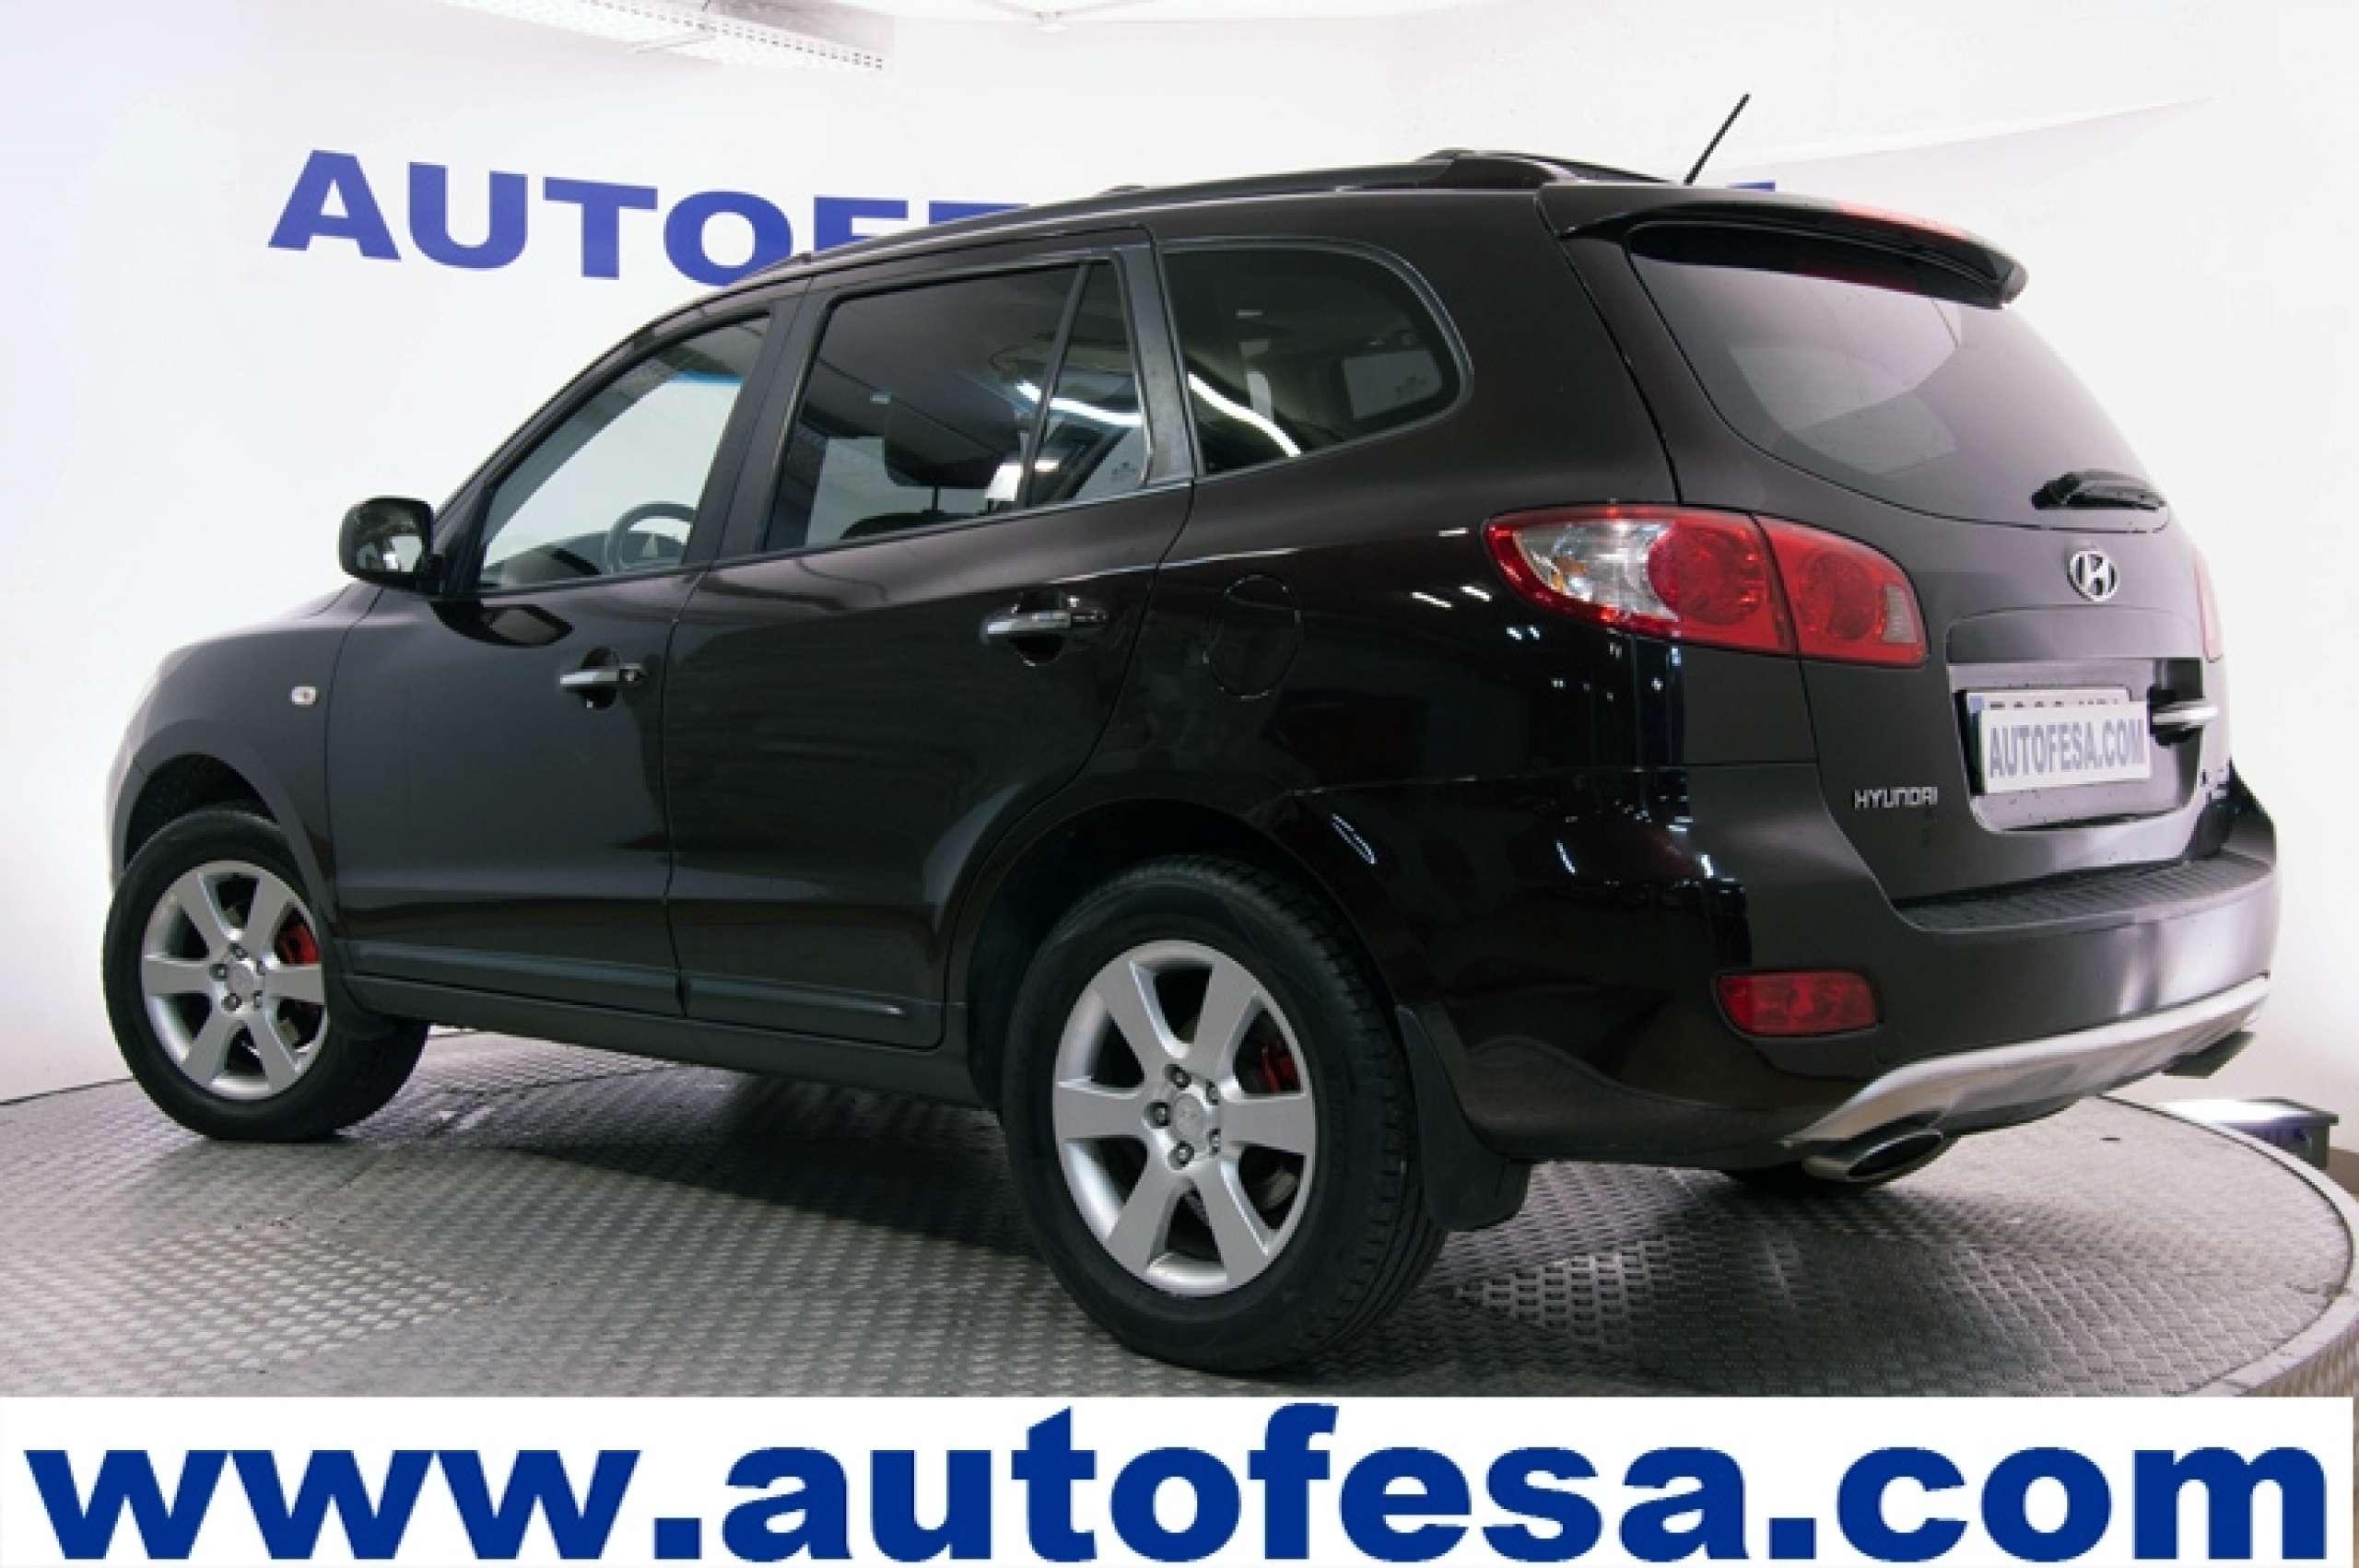 Hyundai Santa Fe 2.2 CRDI 155cv Style Auto 5p - Foto 9